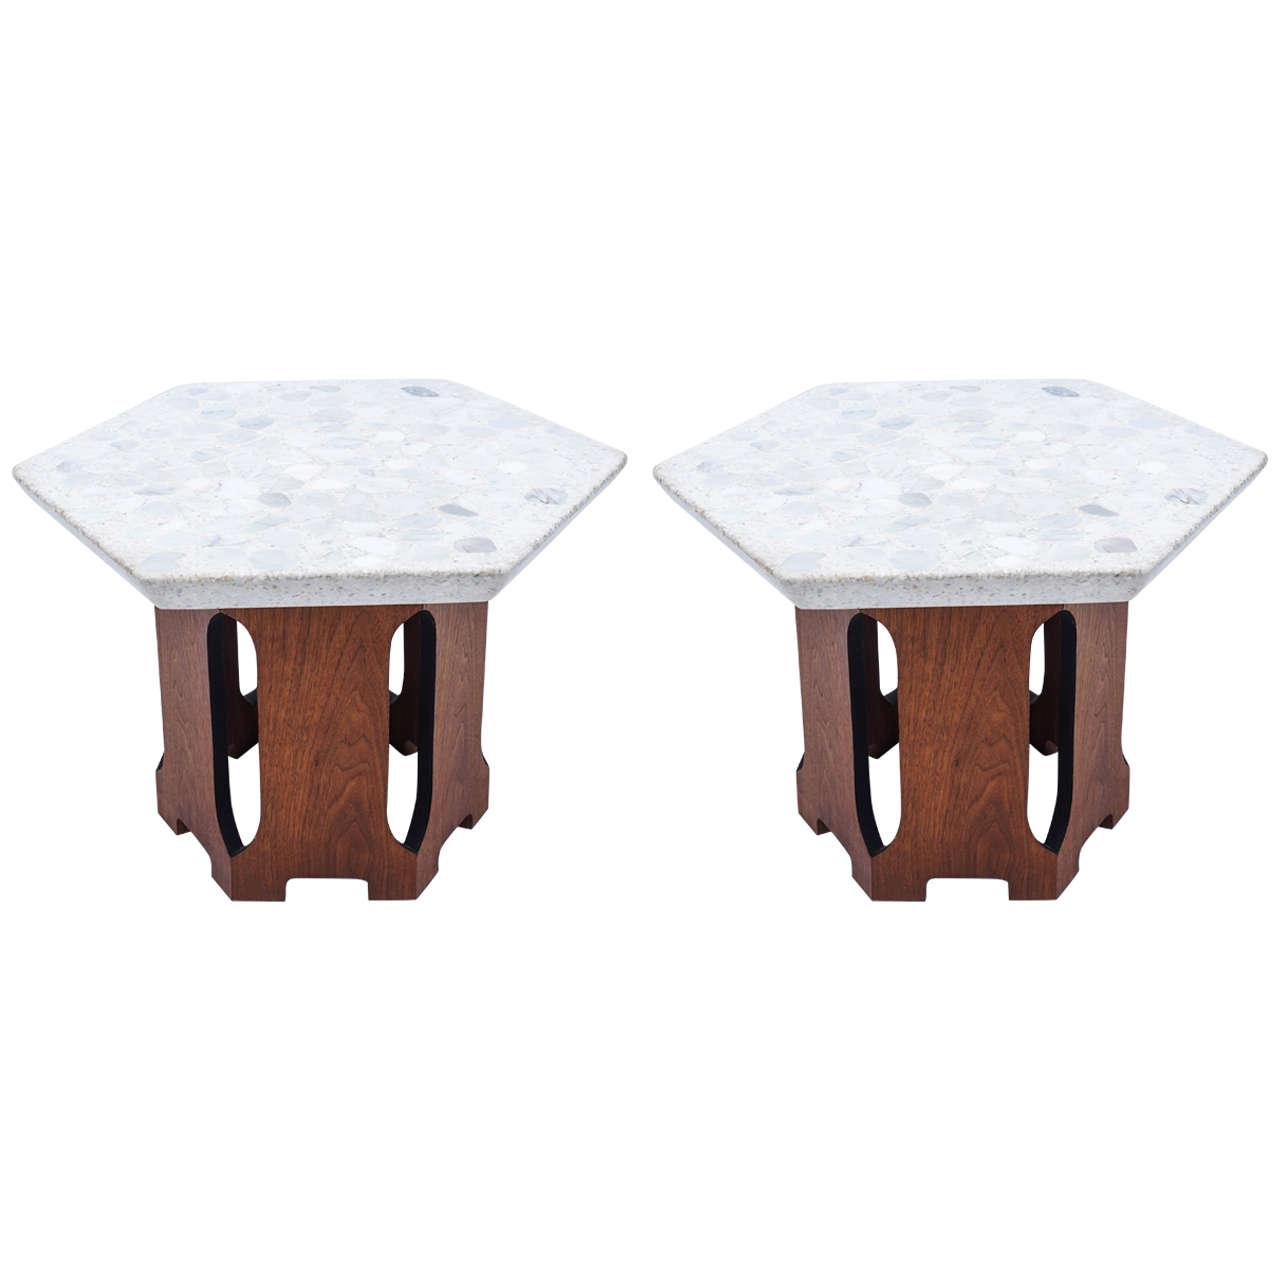 Pair of Harvey Probber Hexagon Composite Tables